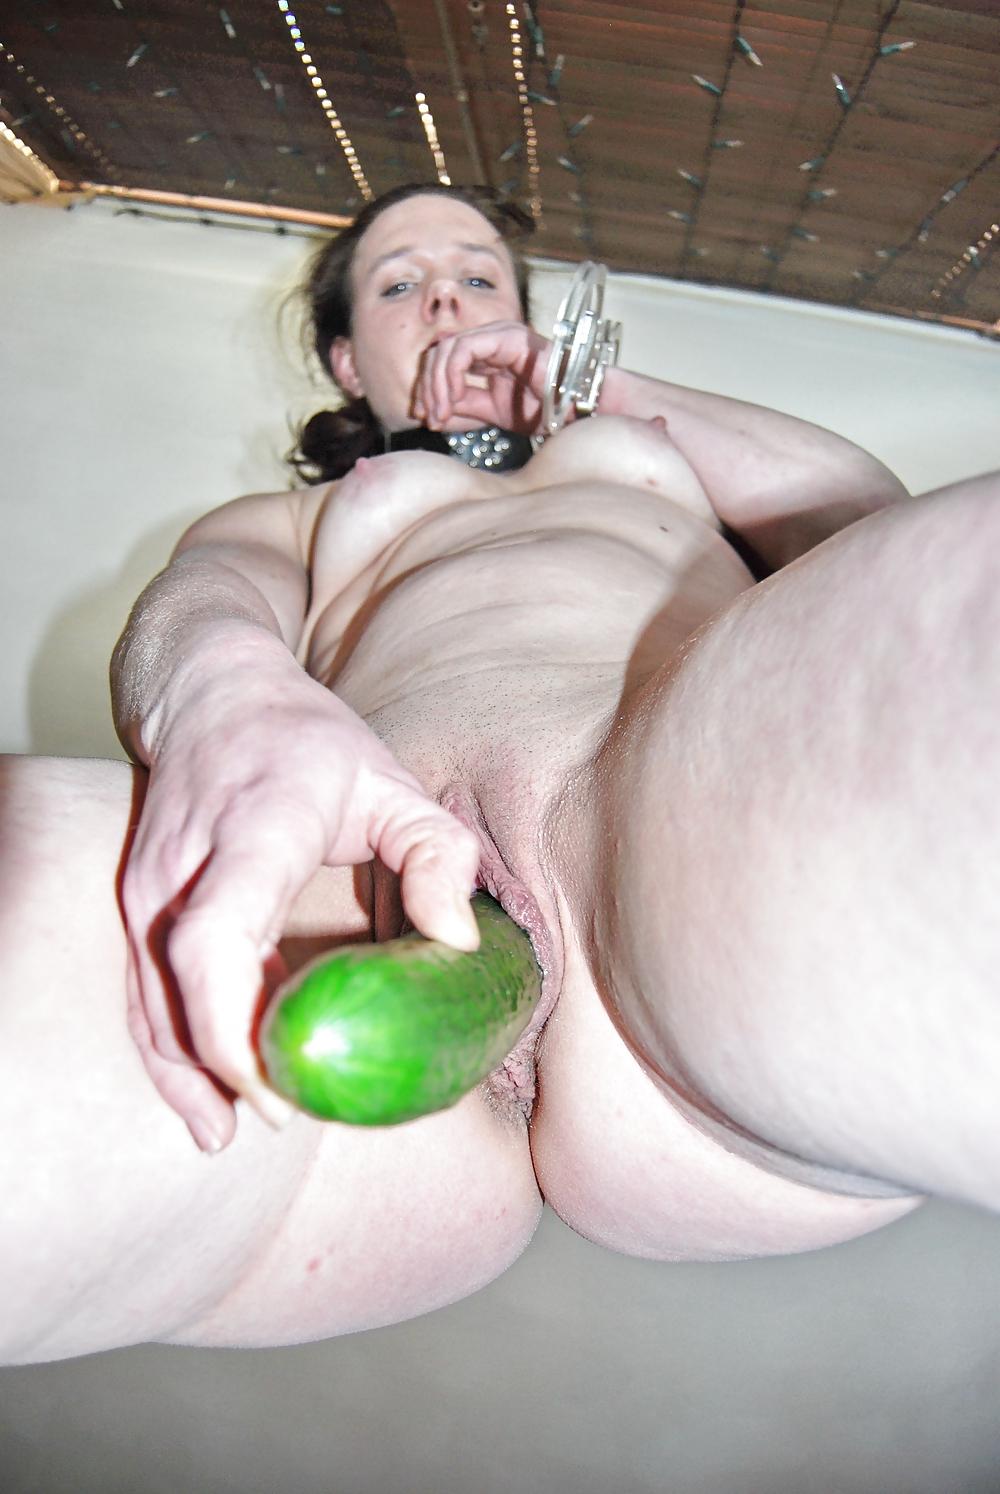 Granny fucking cucumber corn pictures thumbnails